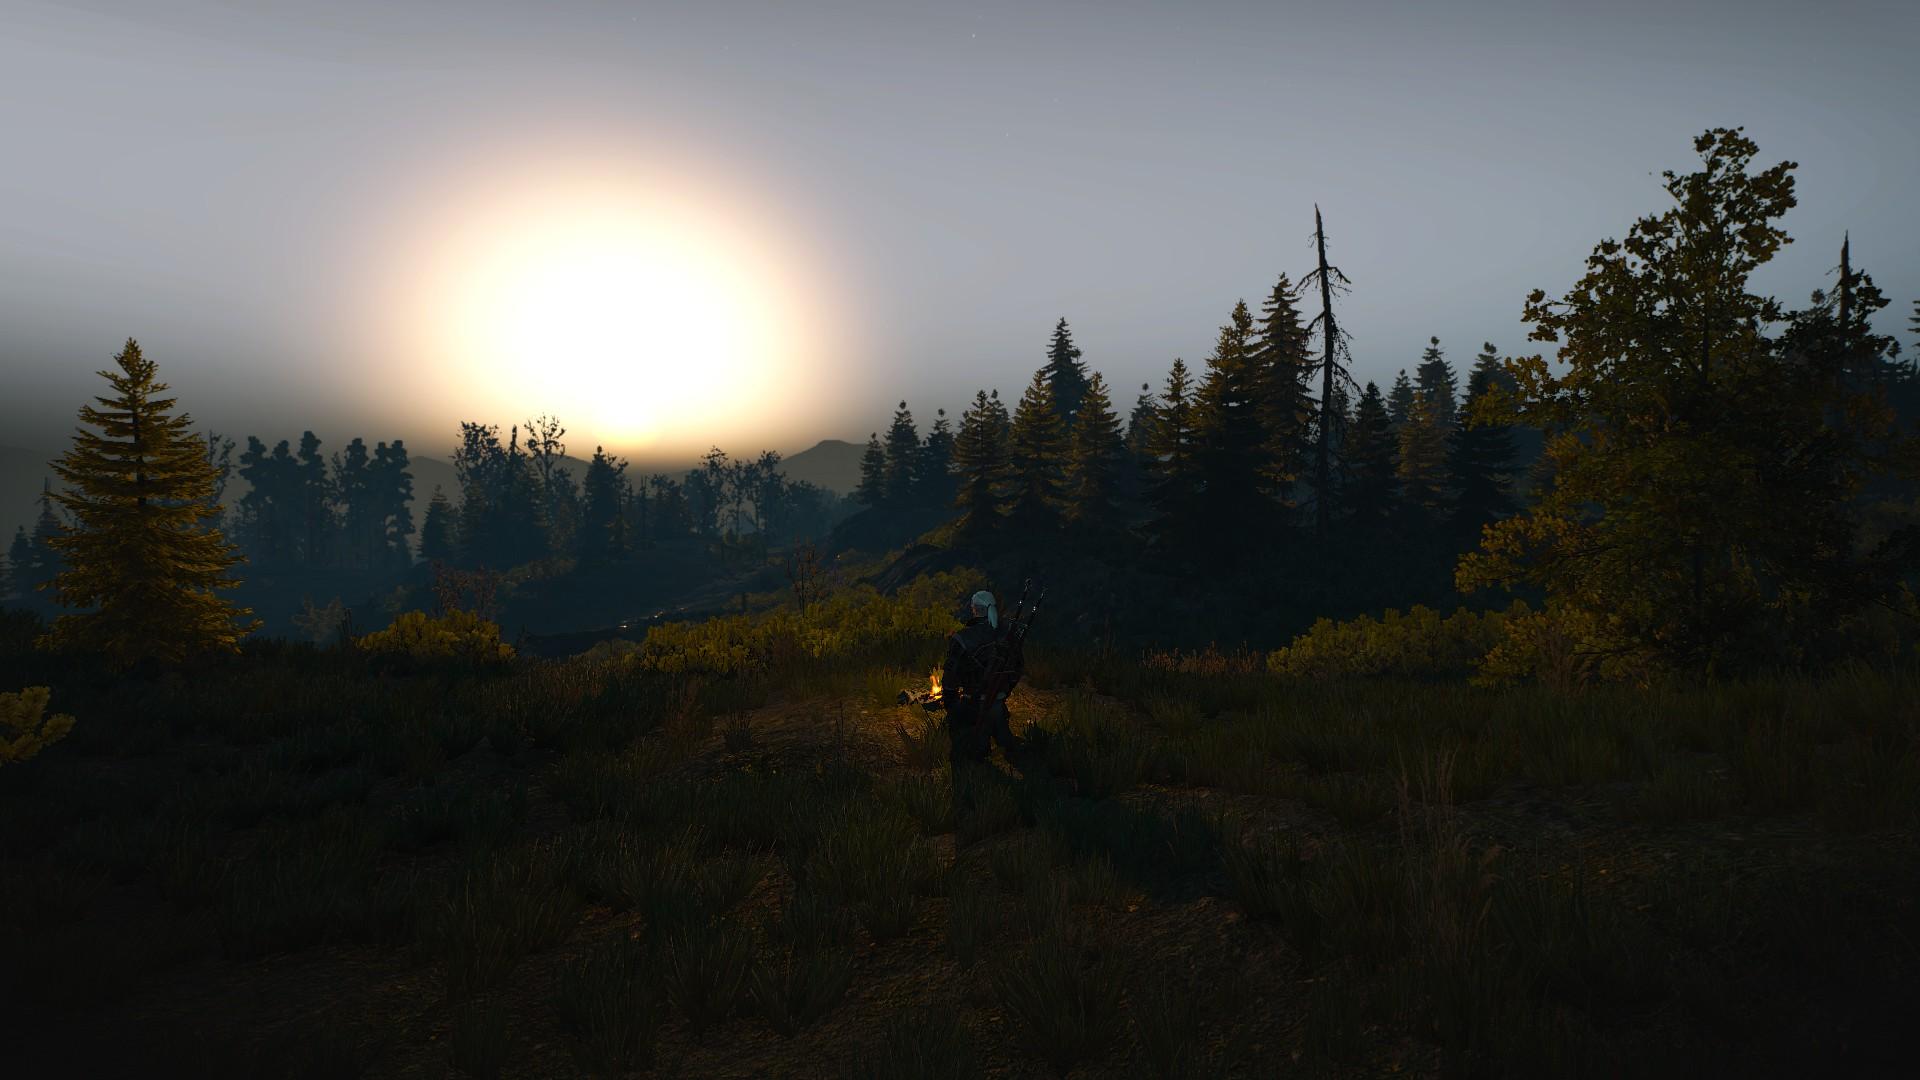 Best Witcher 3 Mods - Preparations Mod